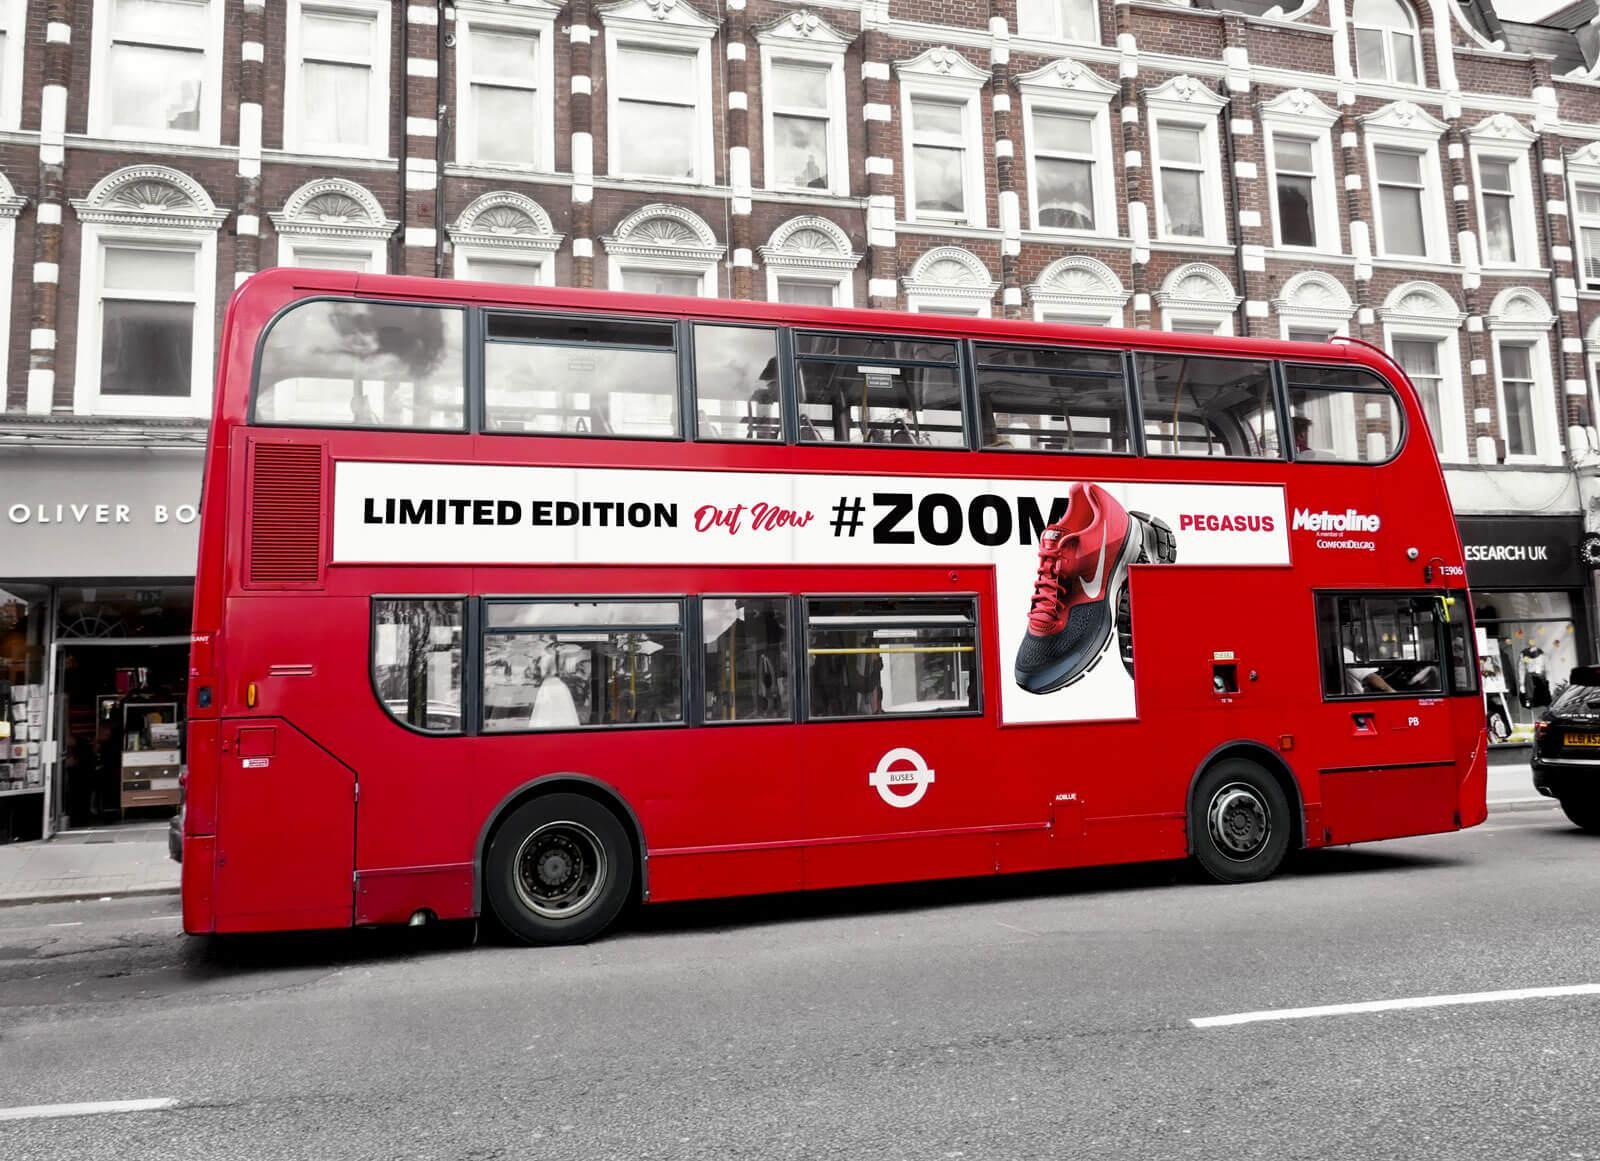 Free-Metroline-London-Bus-on-Suburban-Street-Mockup-PSD (1)